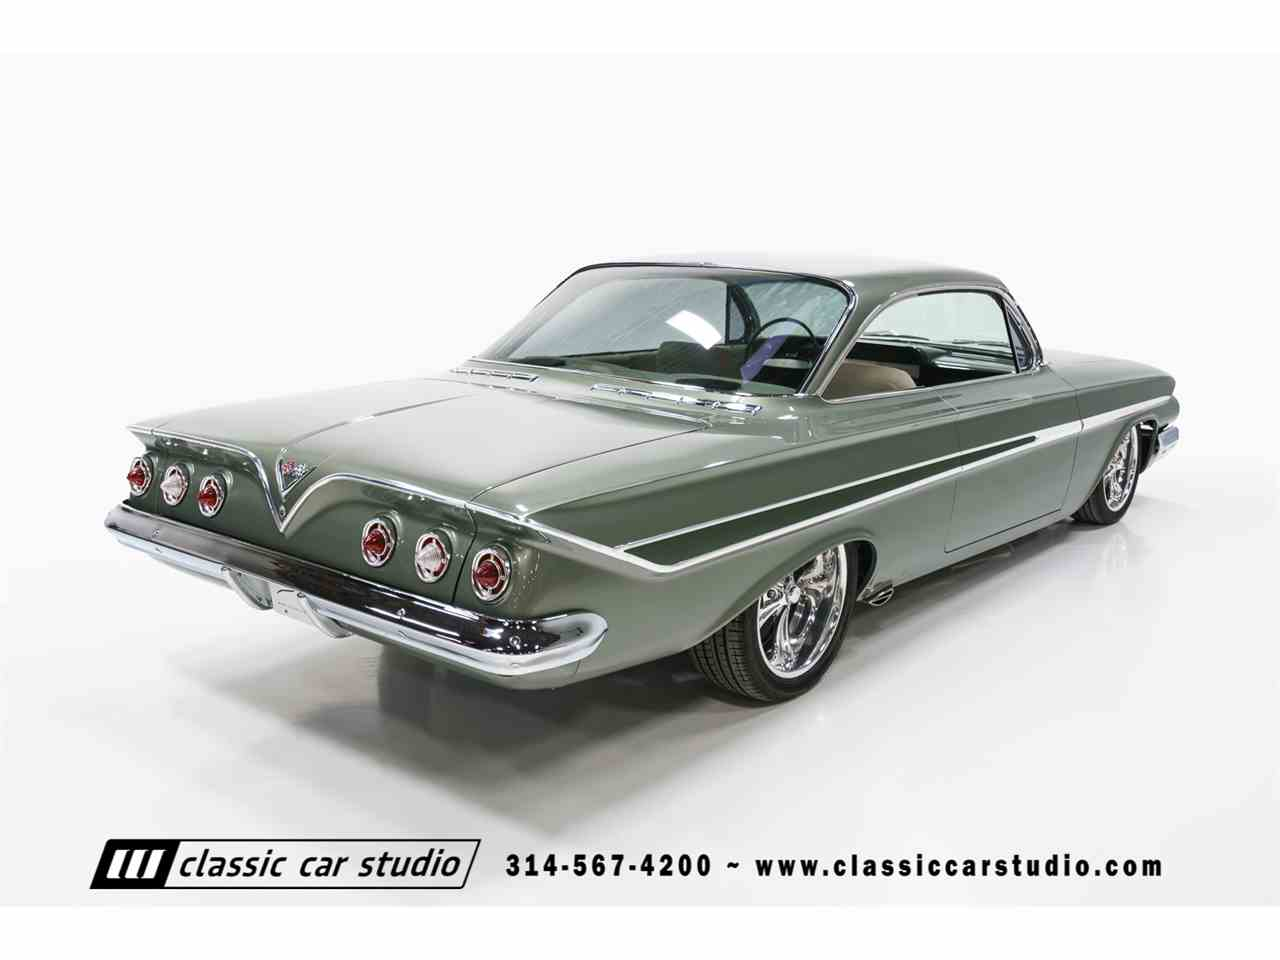 1961 chevrolet impala for sale cc 964166. Black Bedroom Furniture Sets. Home Design Ideas